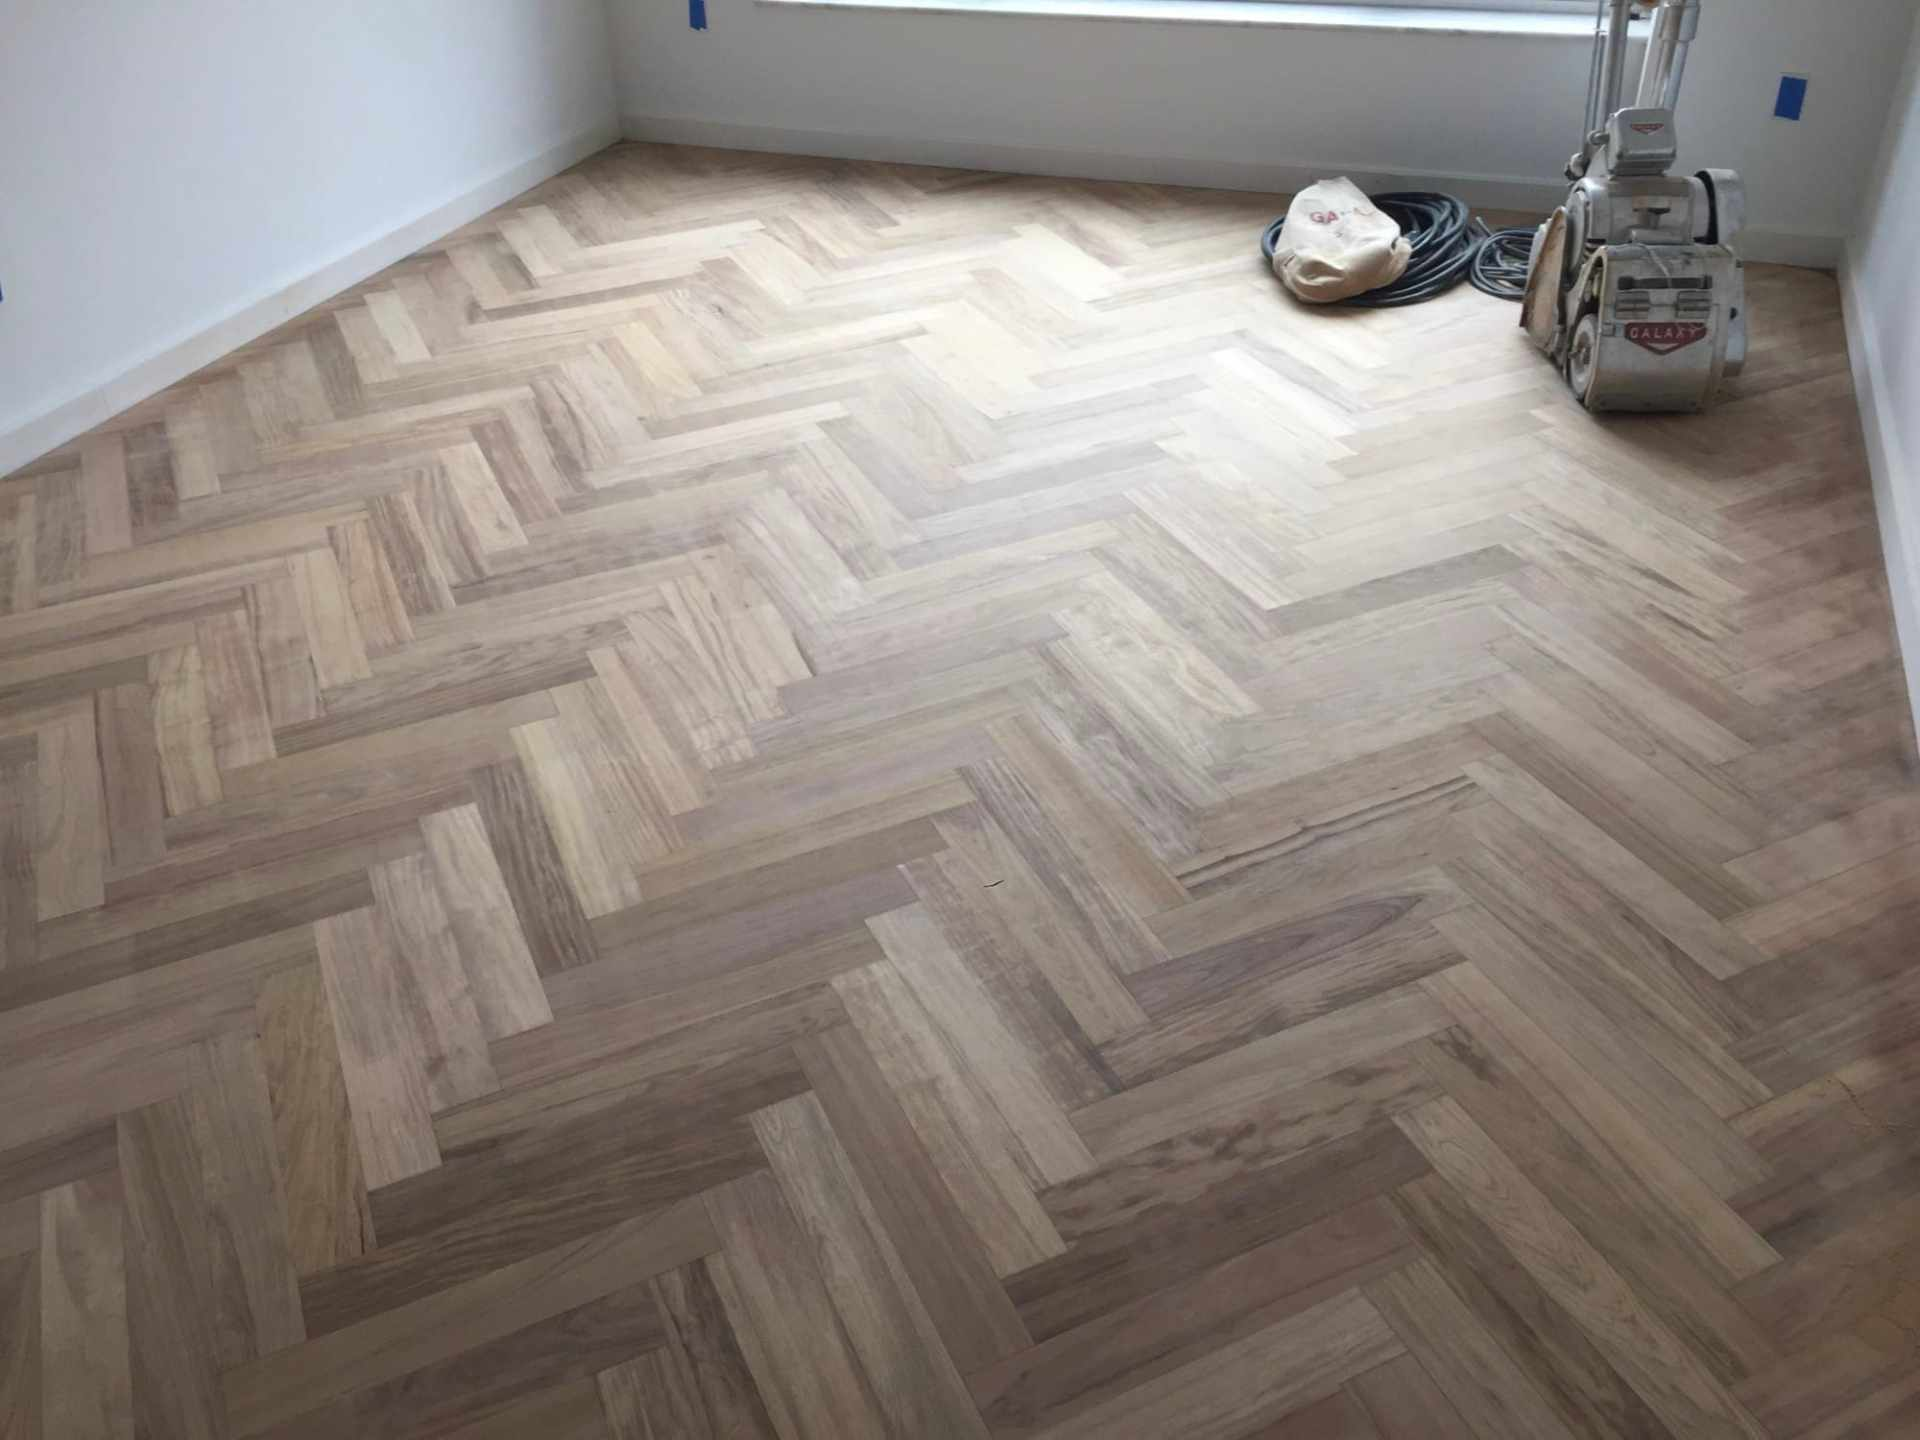 Wood Floor Refinishing in NYC Apartments